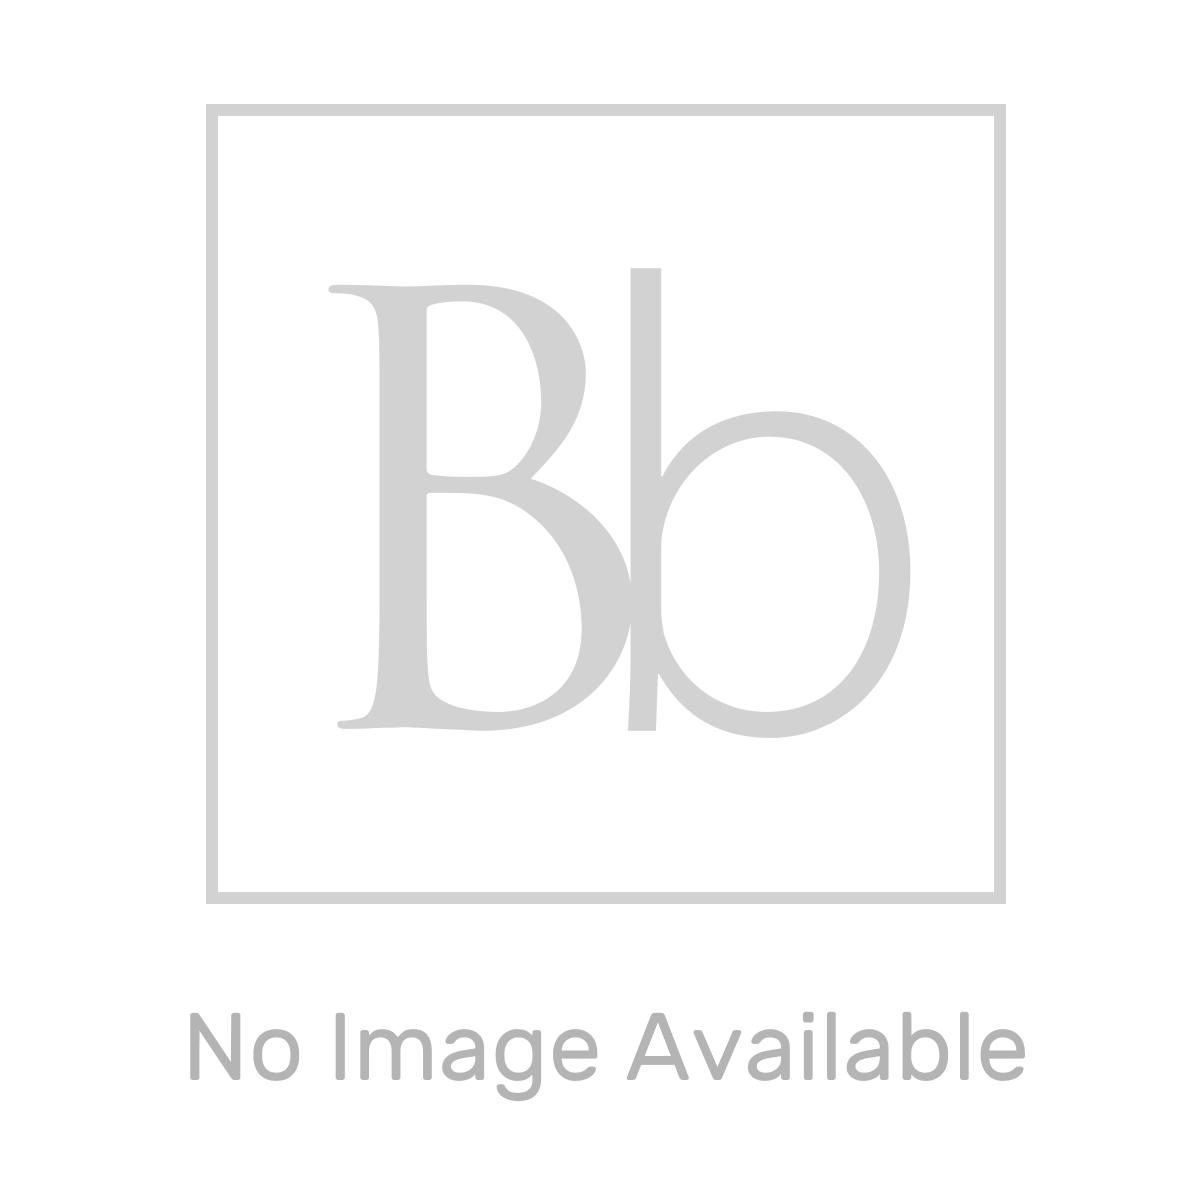 Aquadart Venturi 6 Frameless Bi-Fold Shower Door with Optional Side Panel